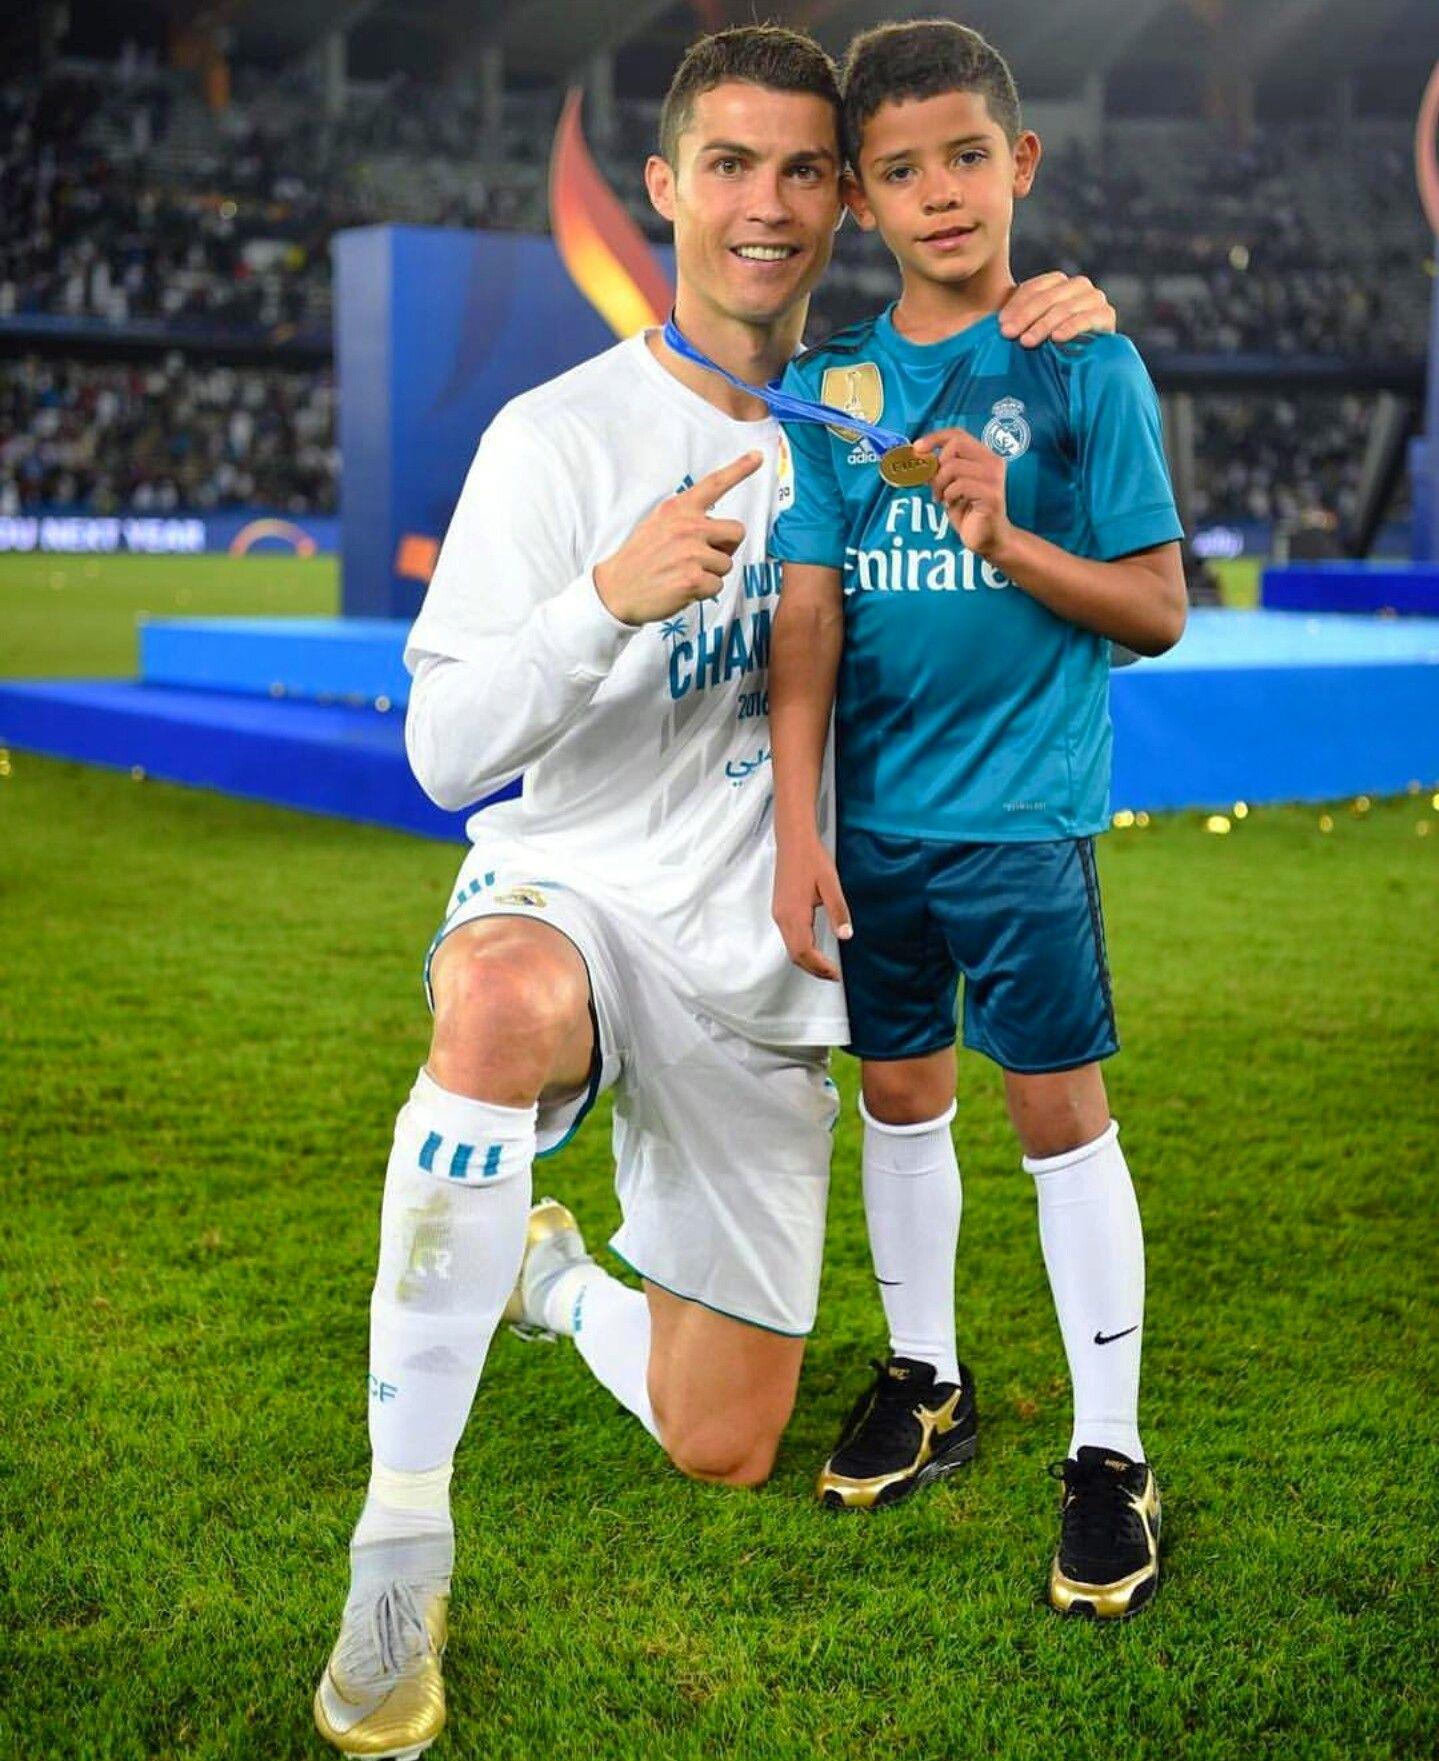 FIFA 2018 World Champions... Mr Cristiano Ronaldo An